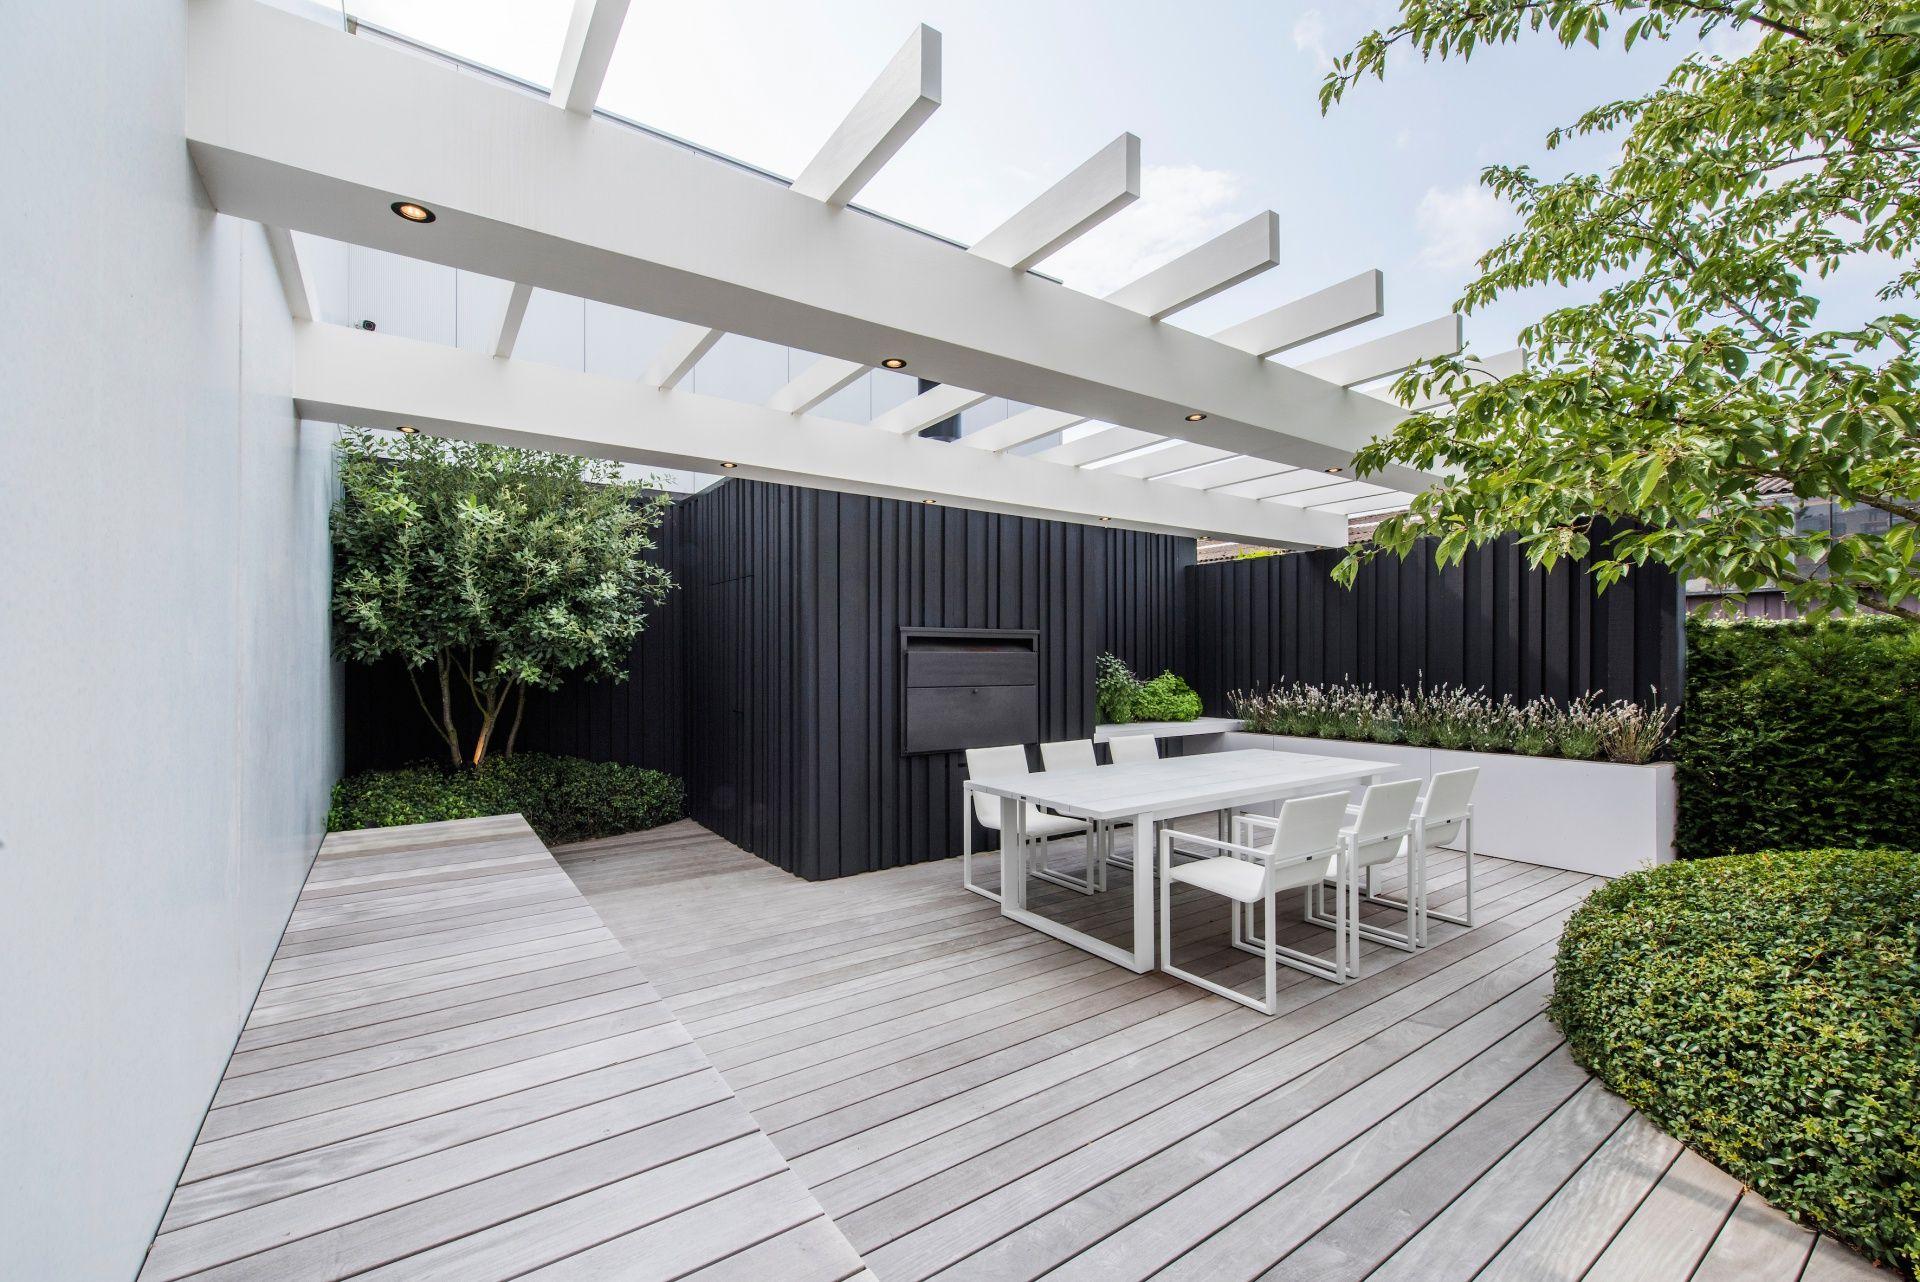 Onze tuinen stijn phlypo tuindesign patio decks and private